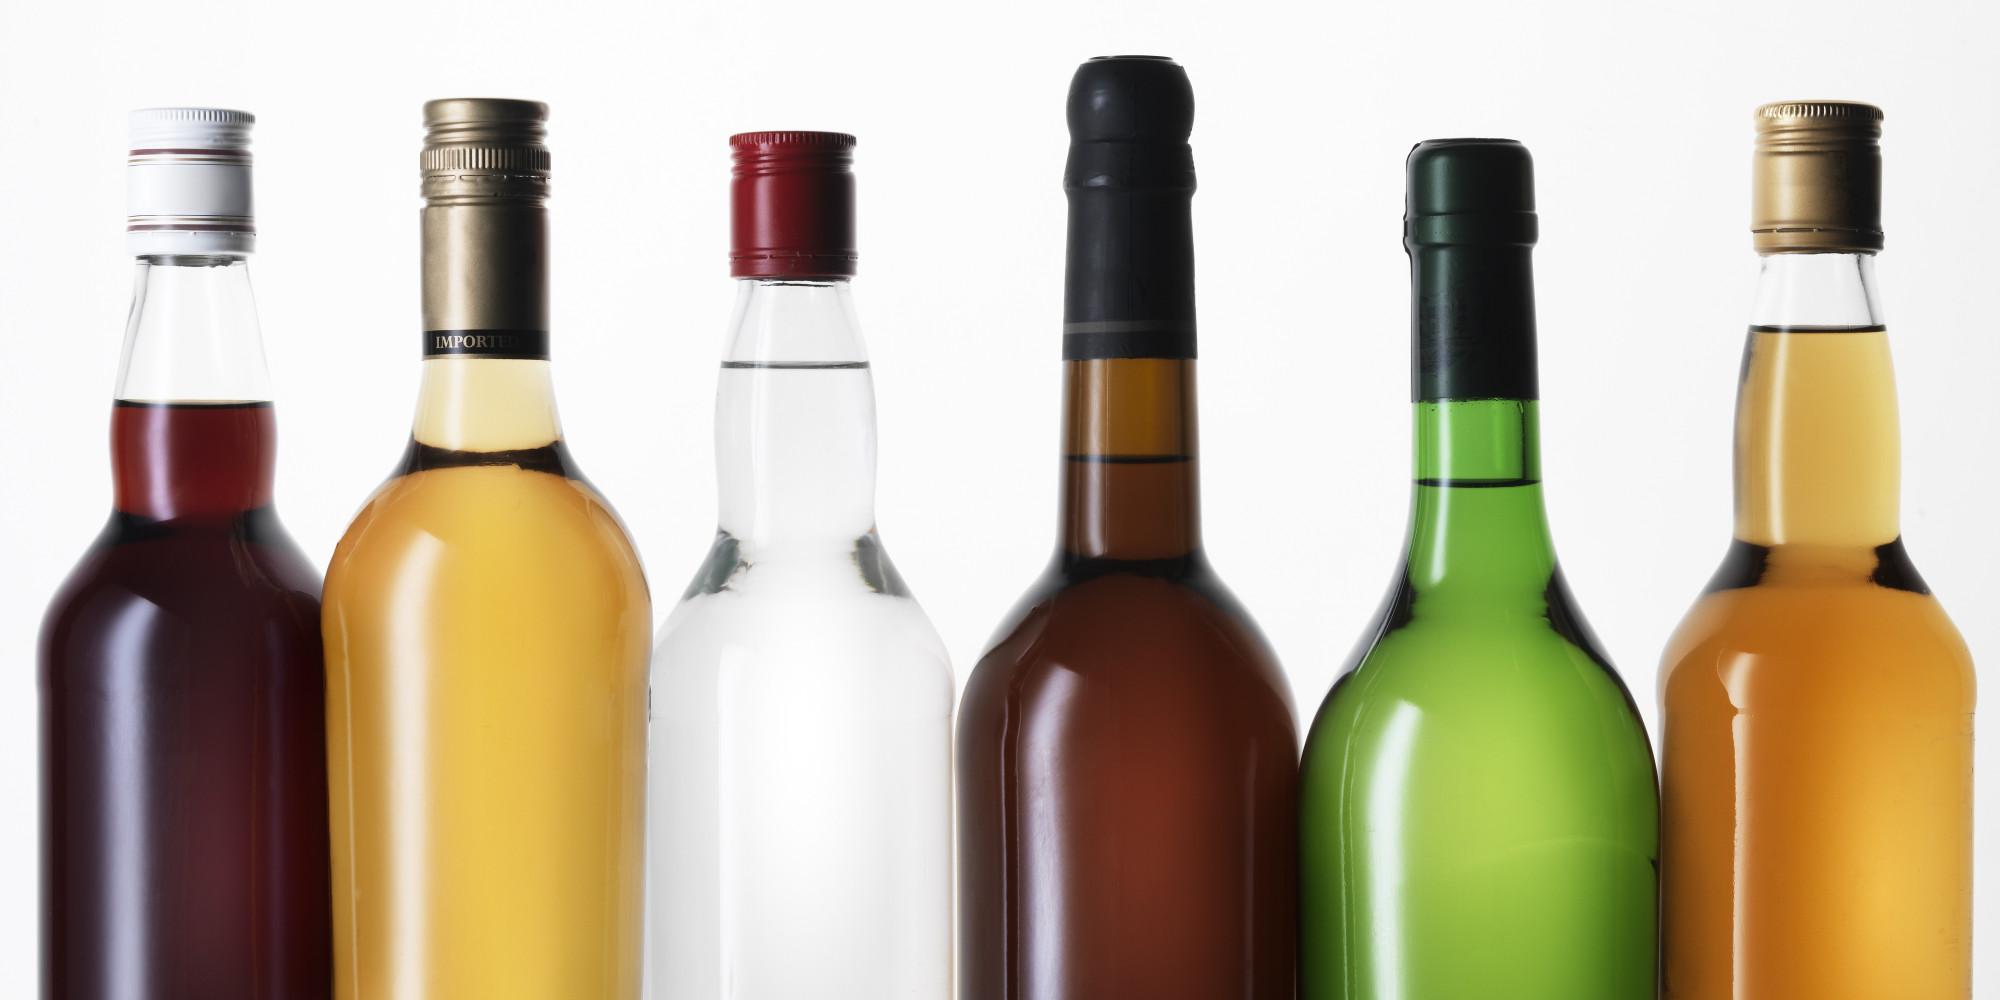 liquor pictures videos breaking news